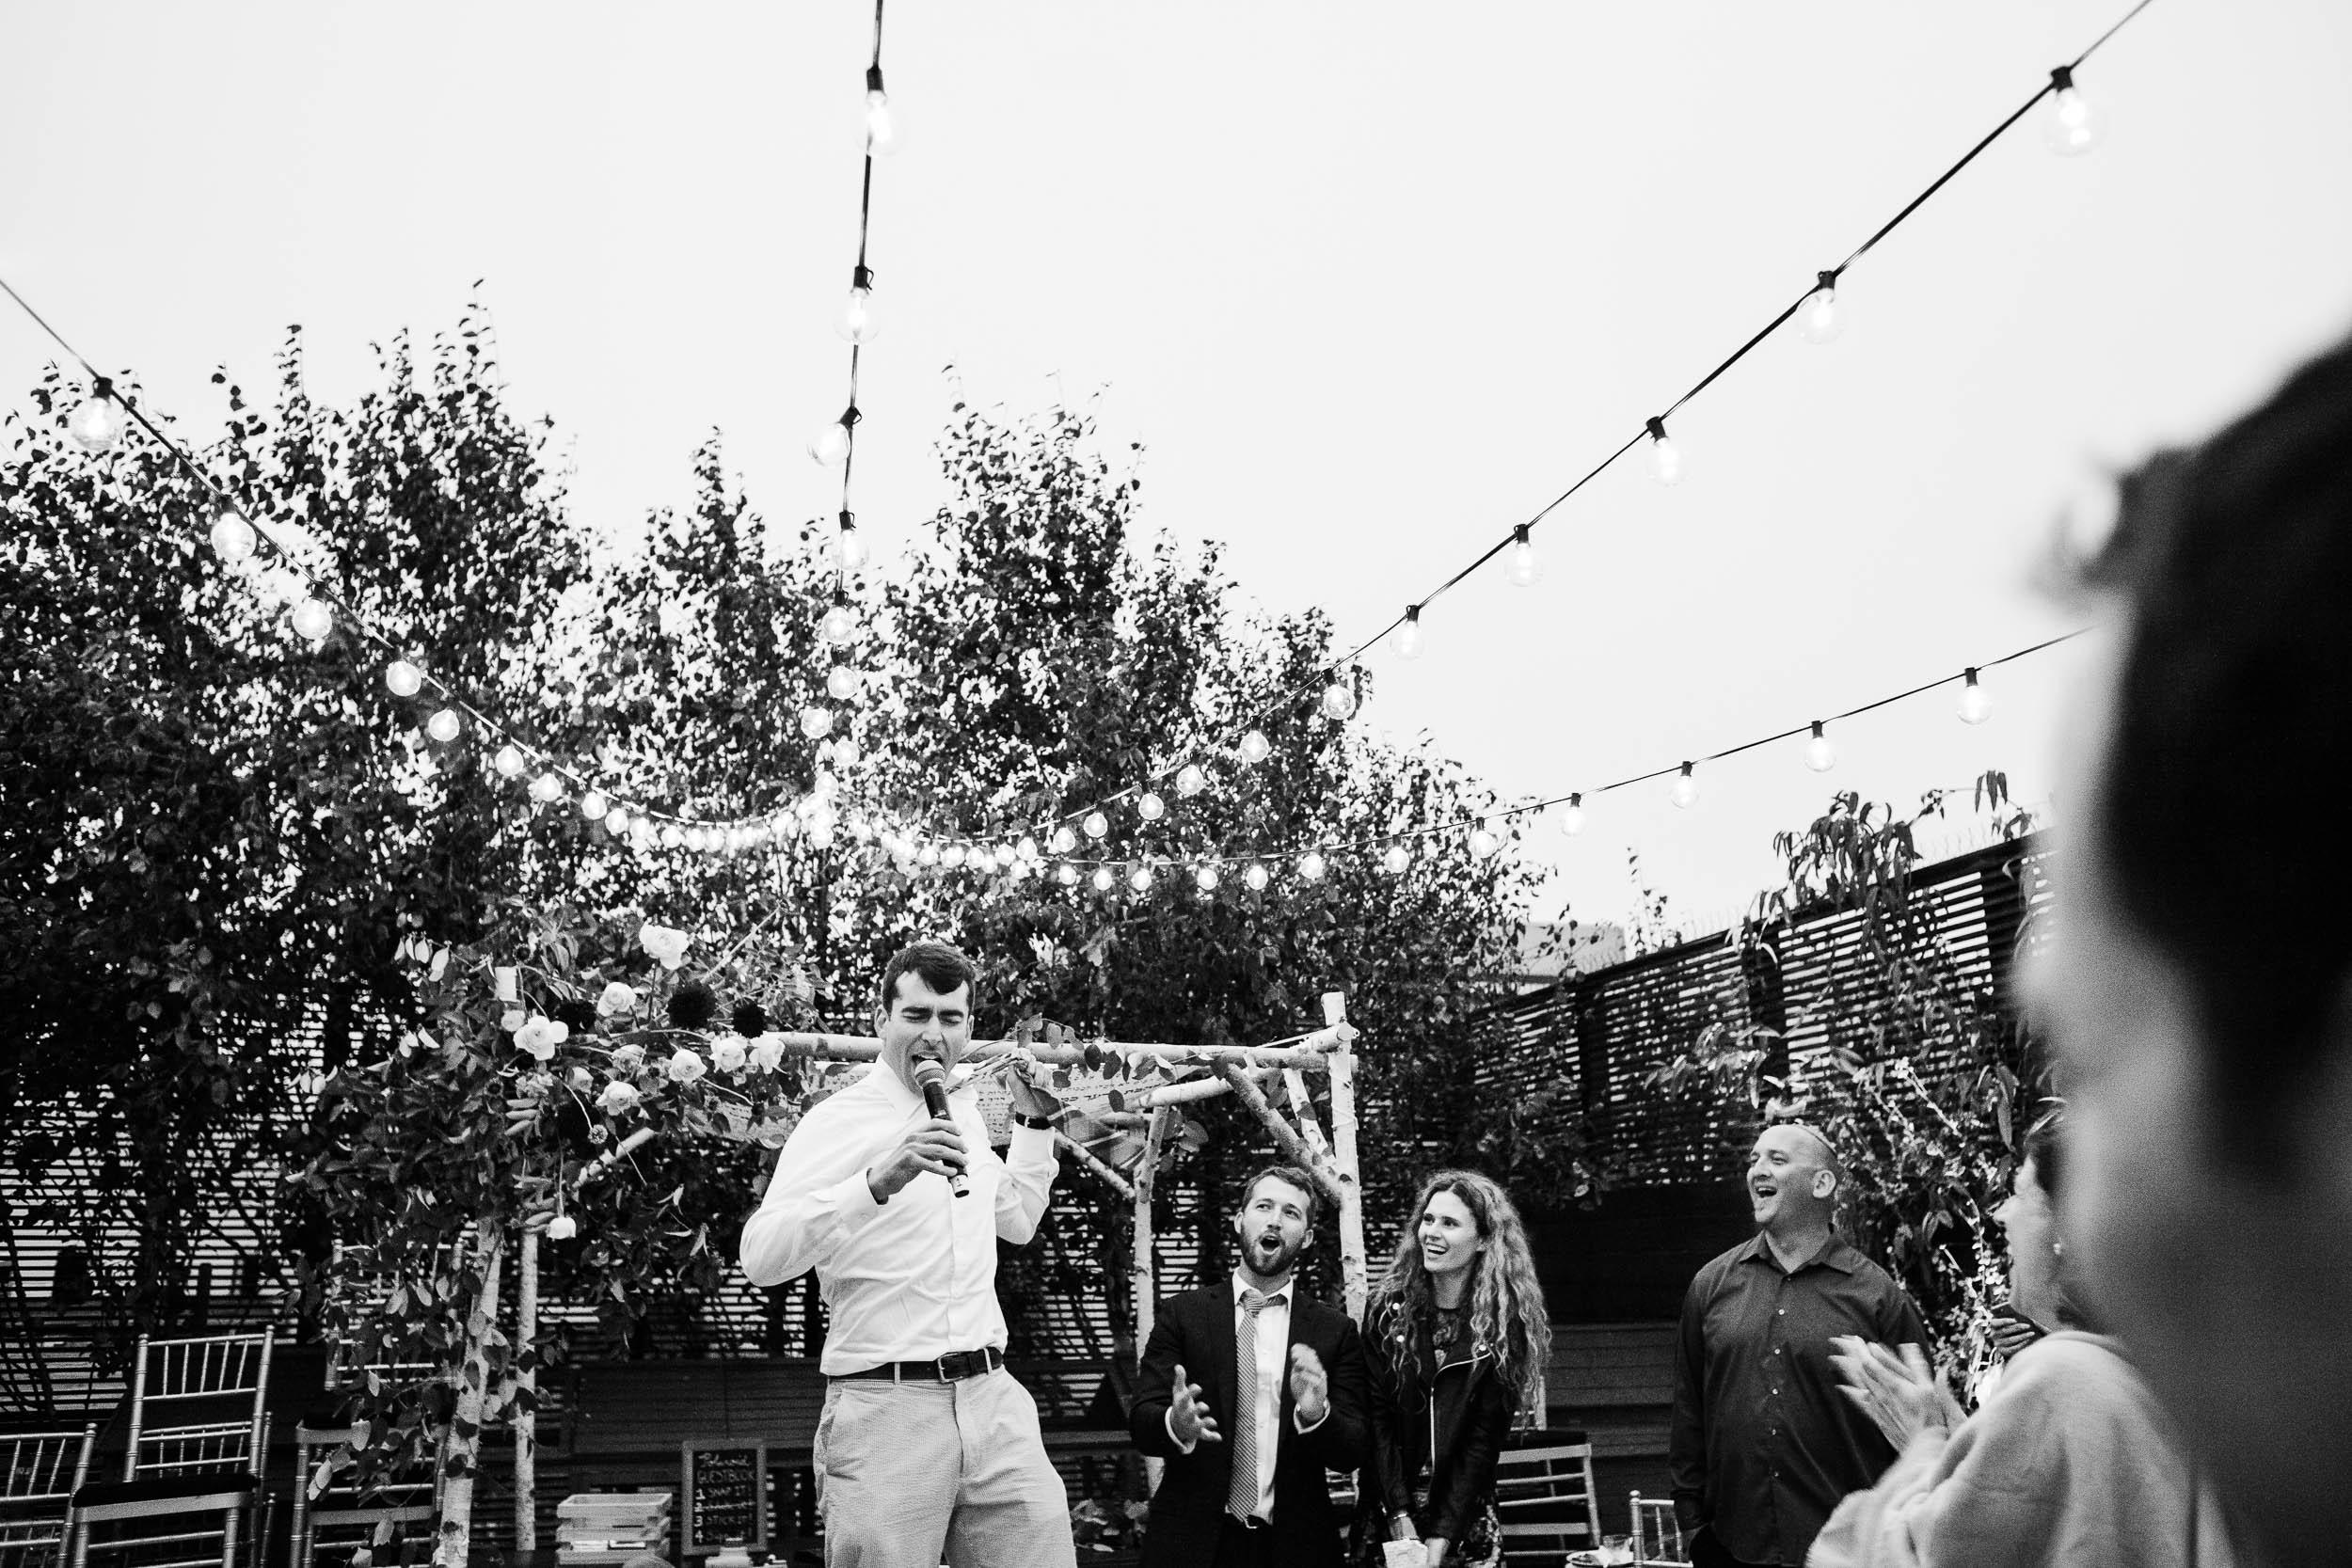 081818_Alina Jason San Francisco Wedding_Buena Lane Photography_3086.jpg